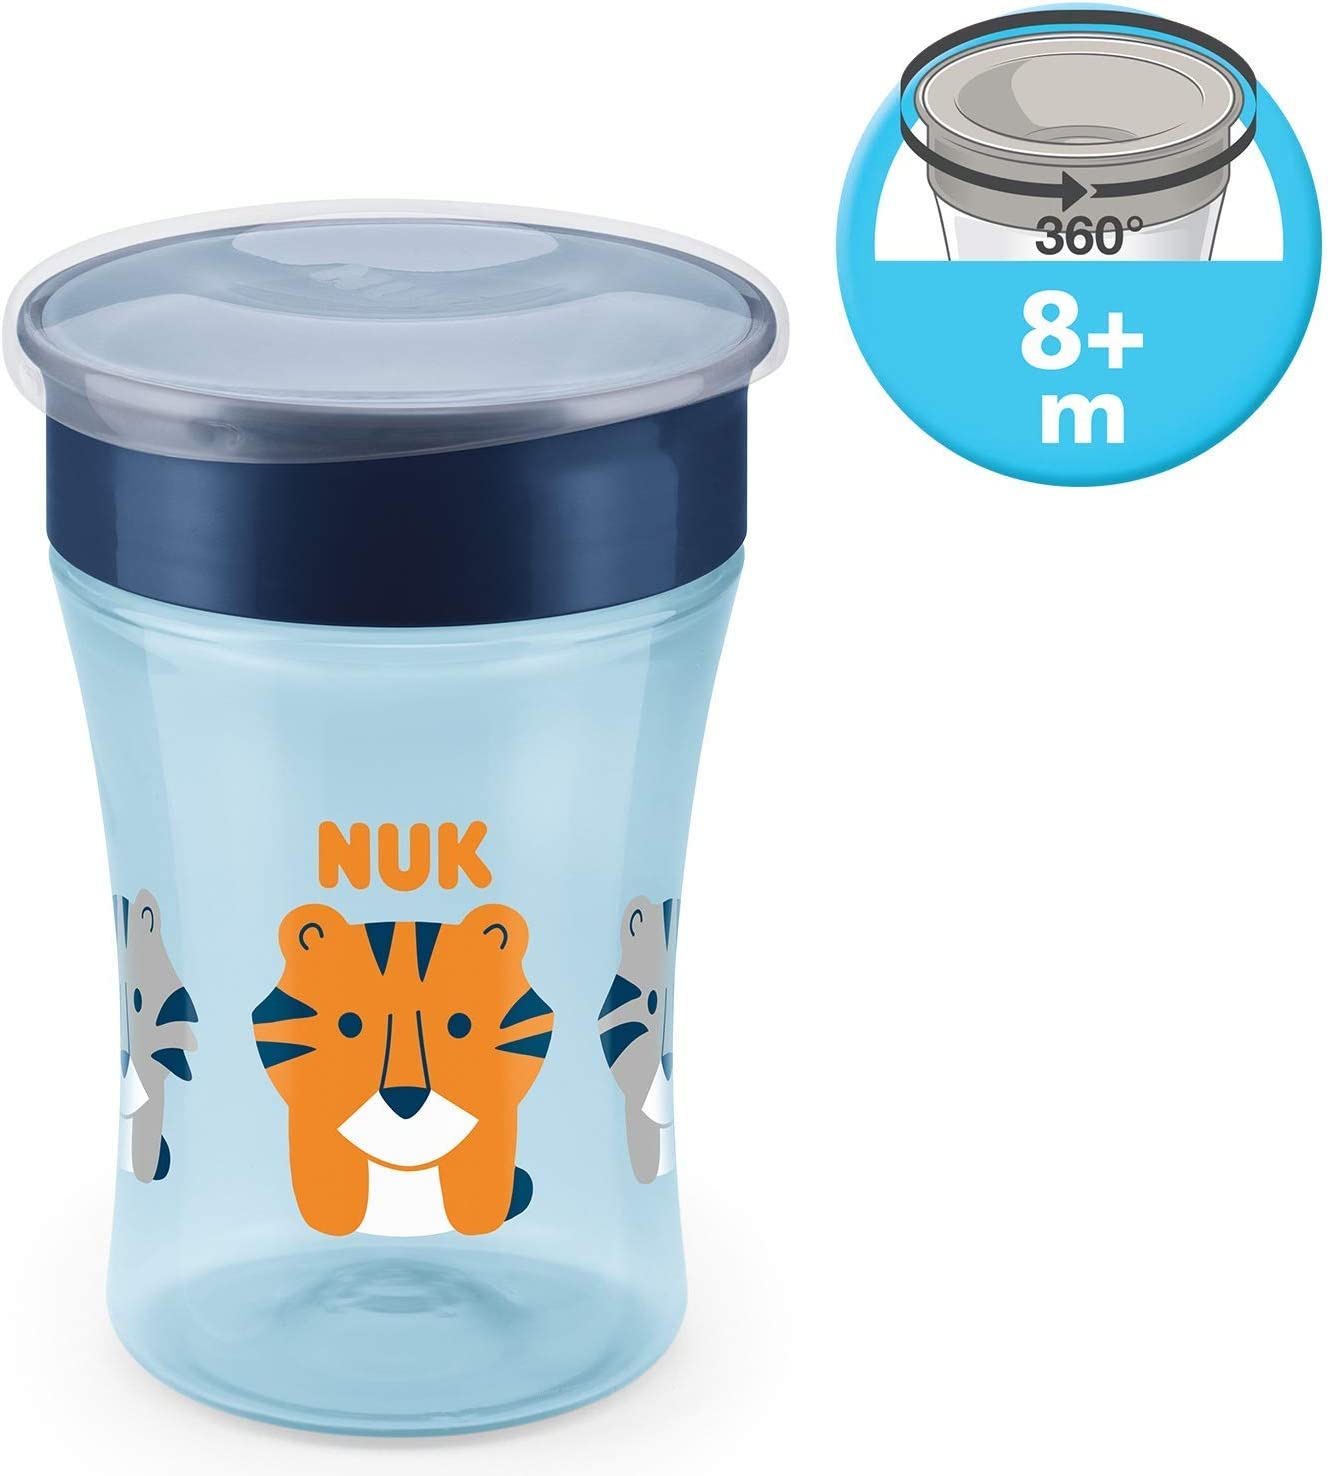 8+ Mesi Topolino senza BPA Bordo 360 230ml Disney Mickey Mouse NUK Magic Cup Bicchiere Antigoccia per Bambini